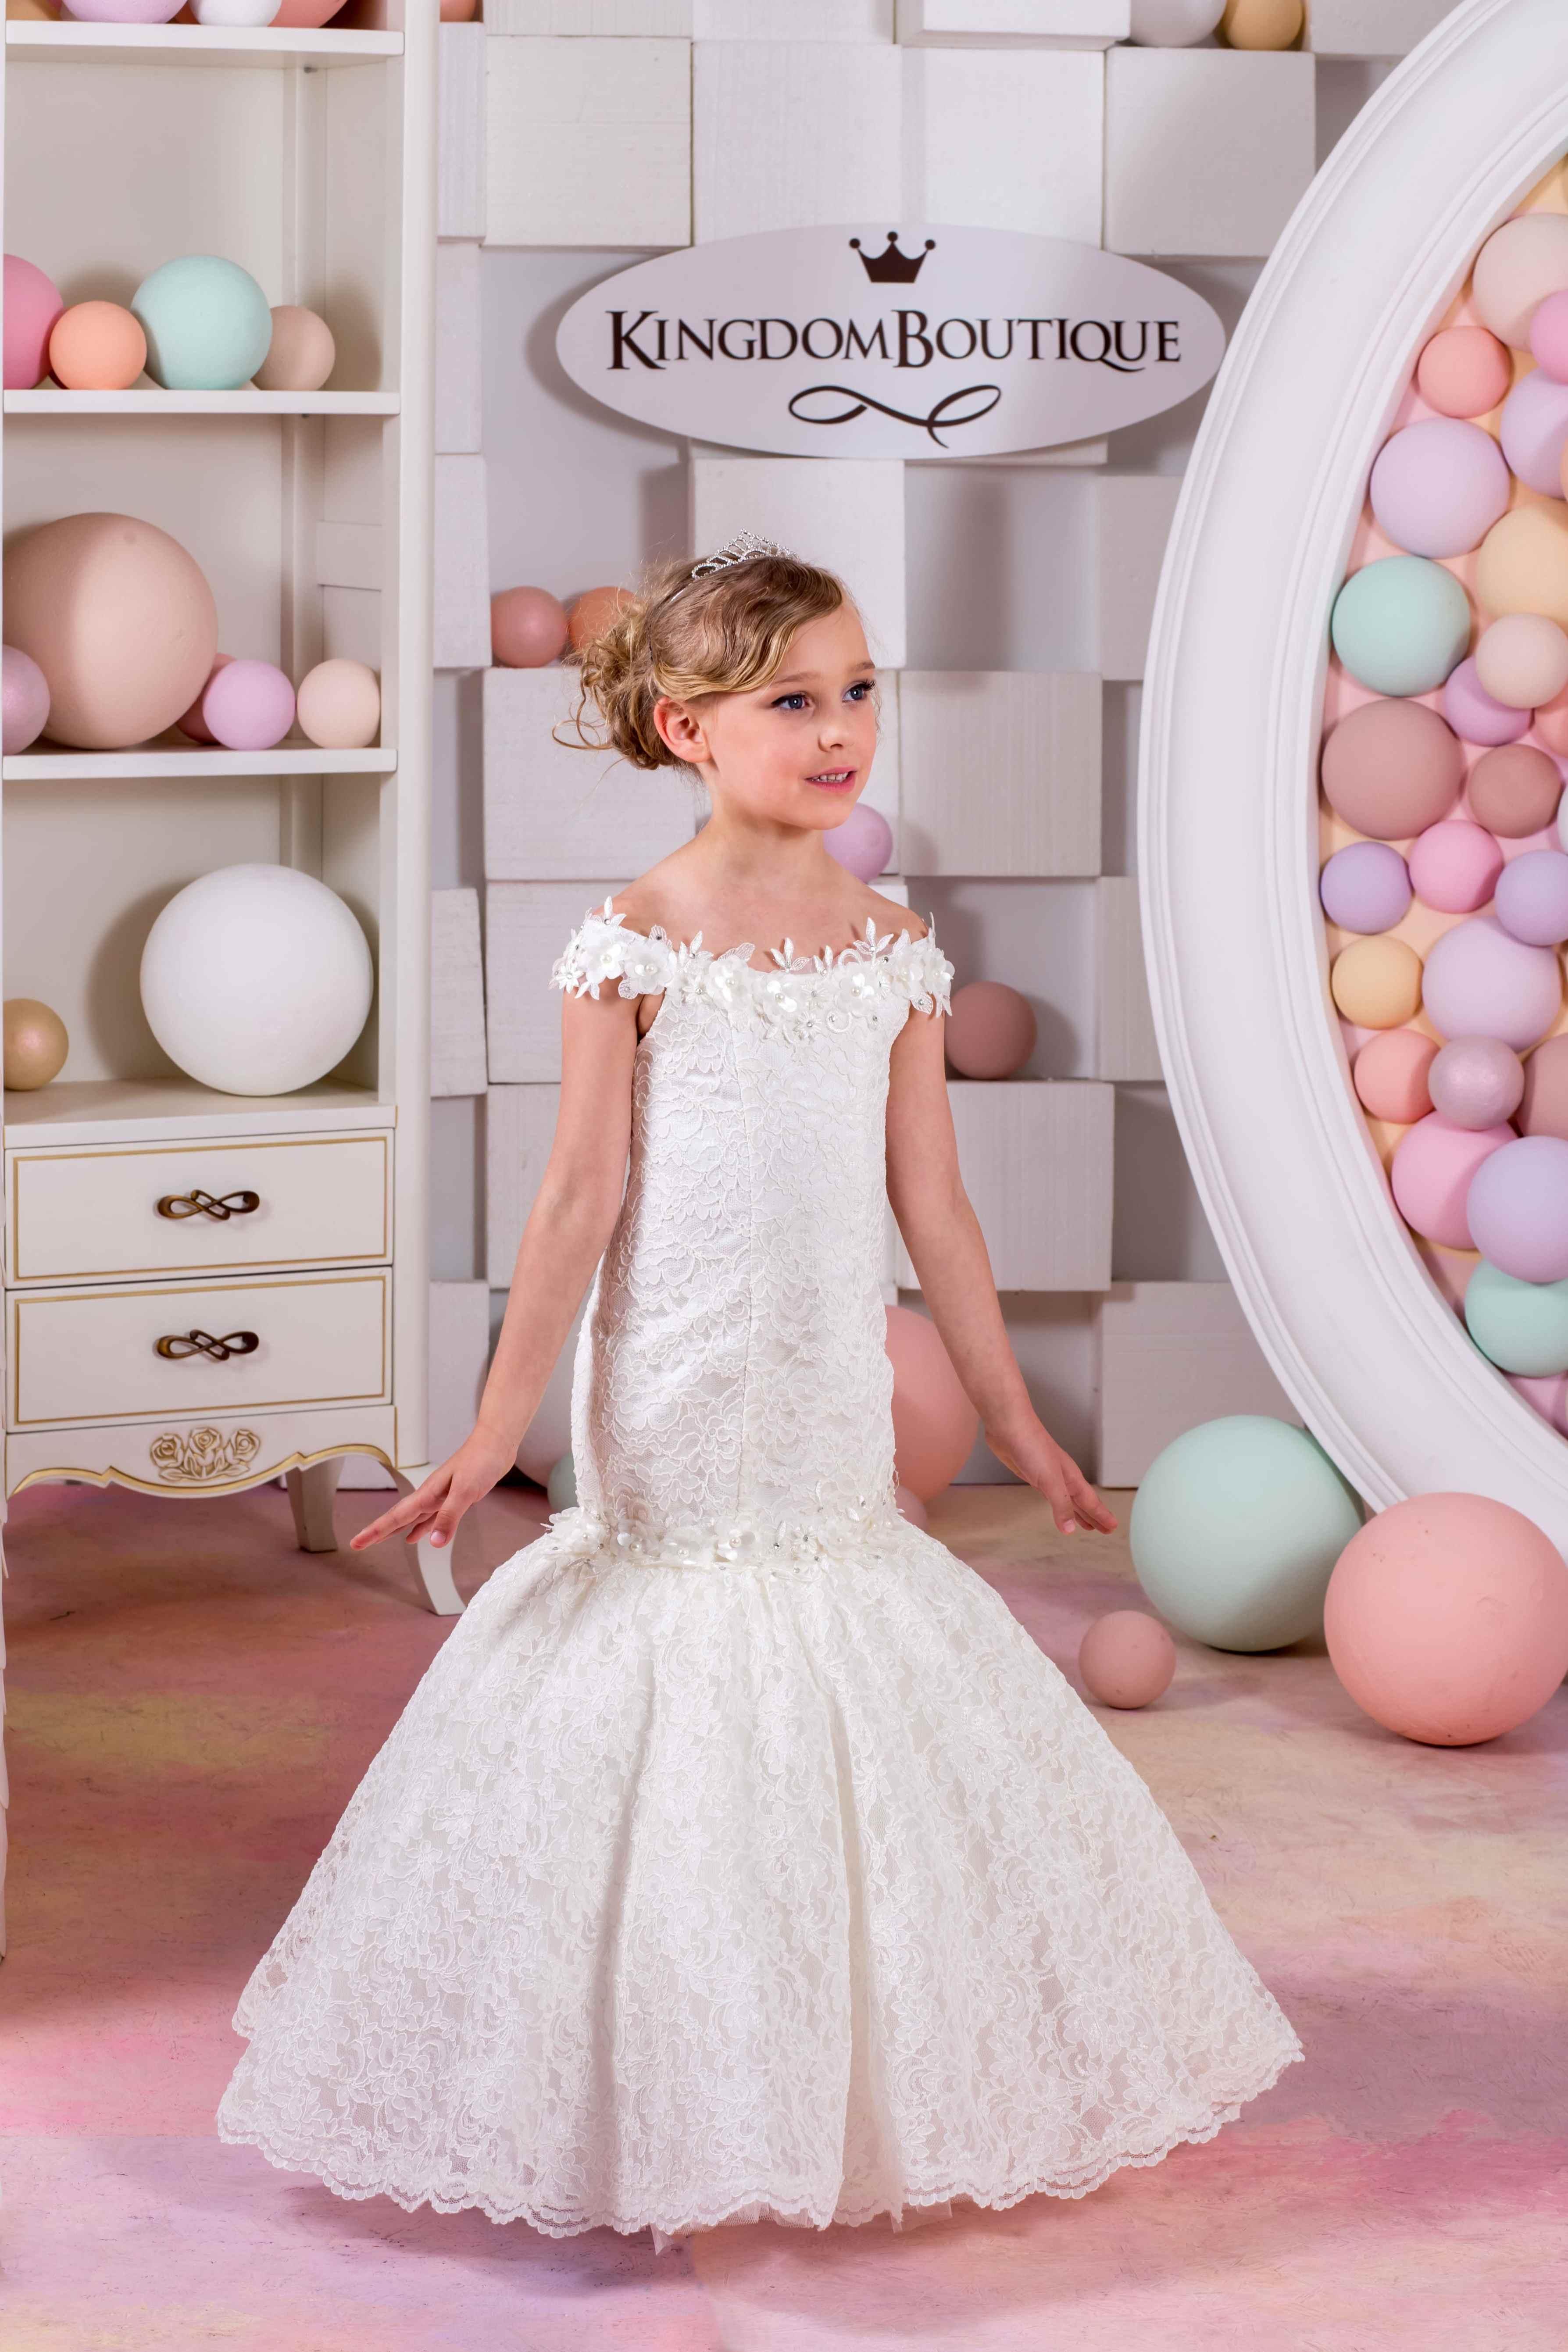 Flower Girl Dress 15 034 Kingdom Boutique